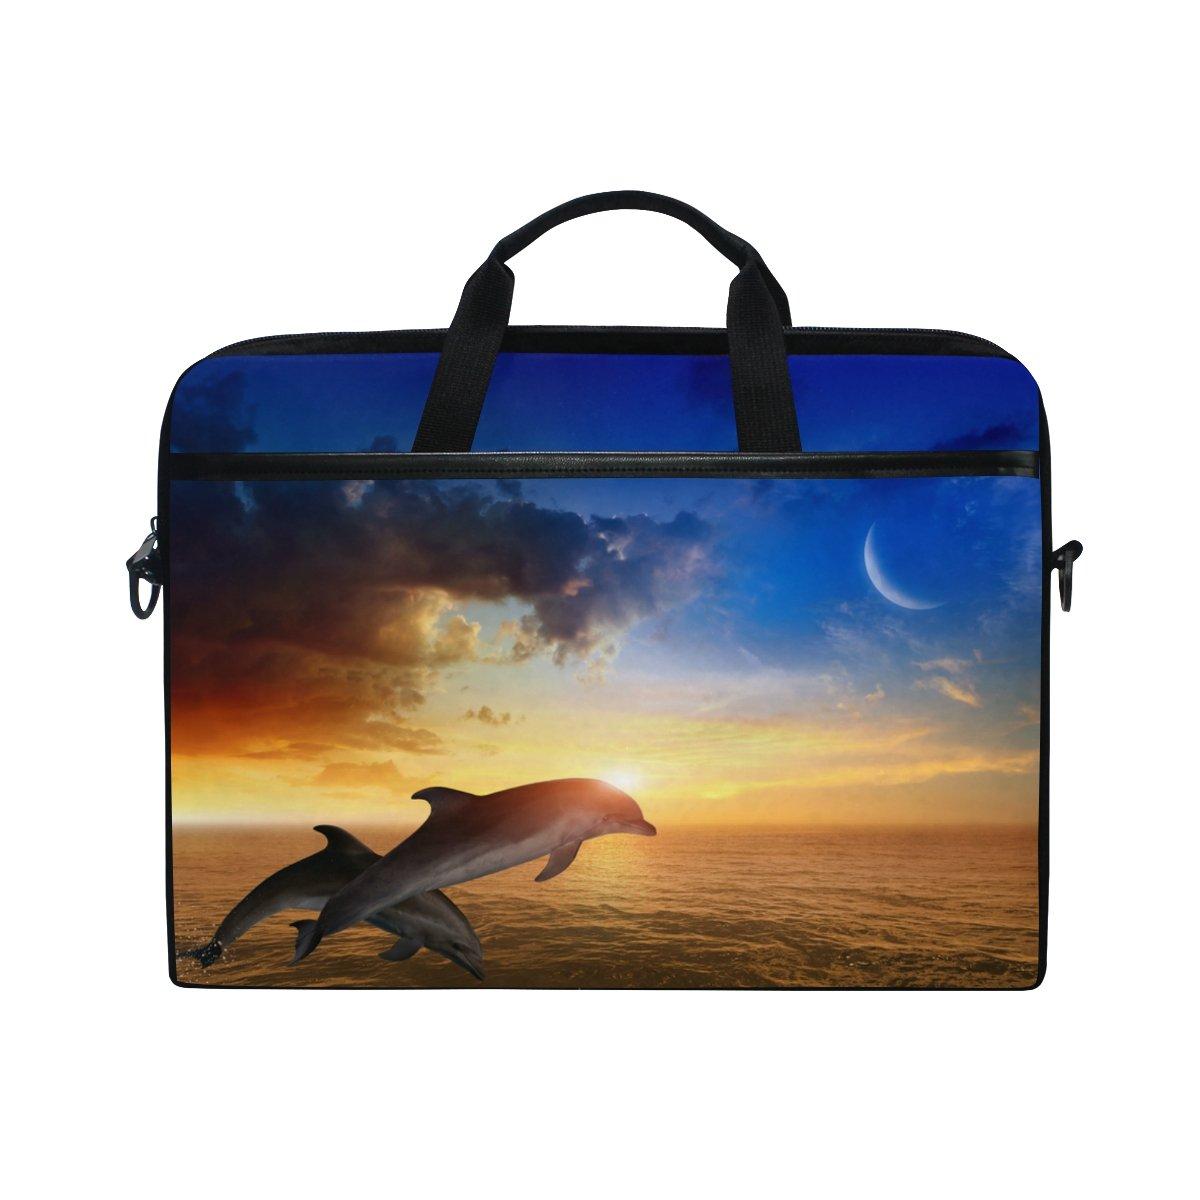 0651a0fcbc ALAZA Cute Dolphins Laptop Bag Shoulder Bag Briefcase Messenger Tablet Bag  15 15.6 Inch for Women